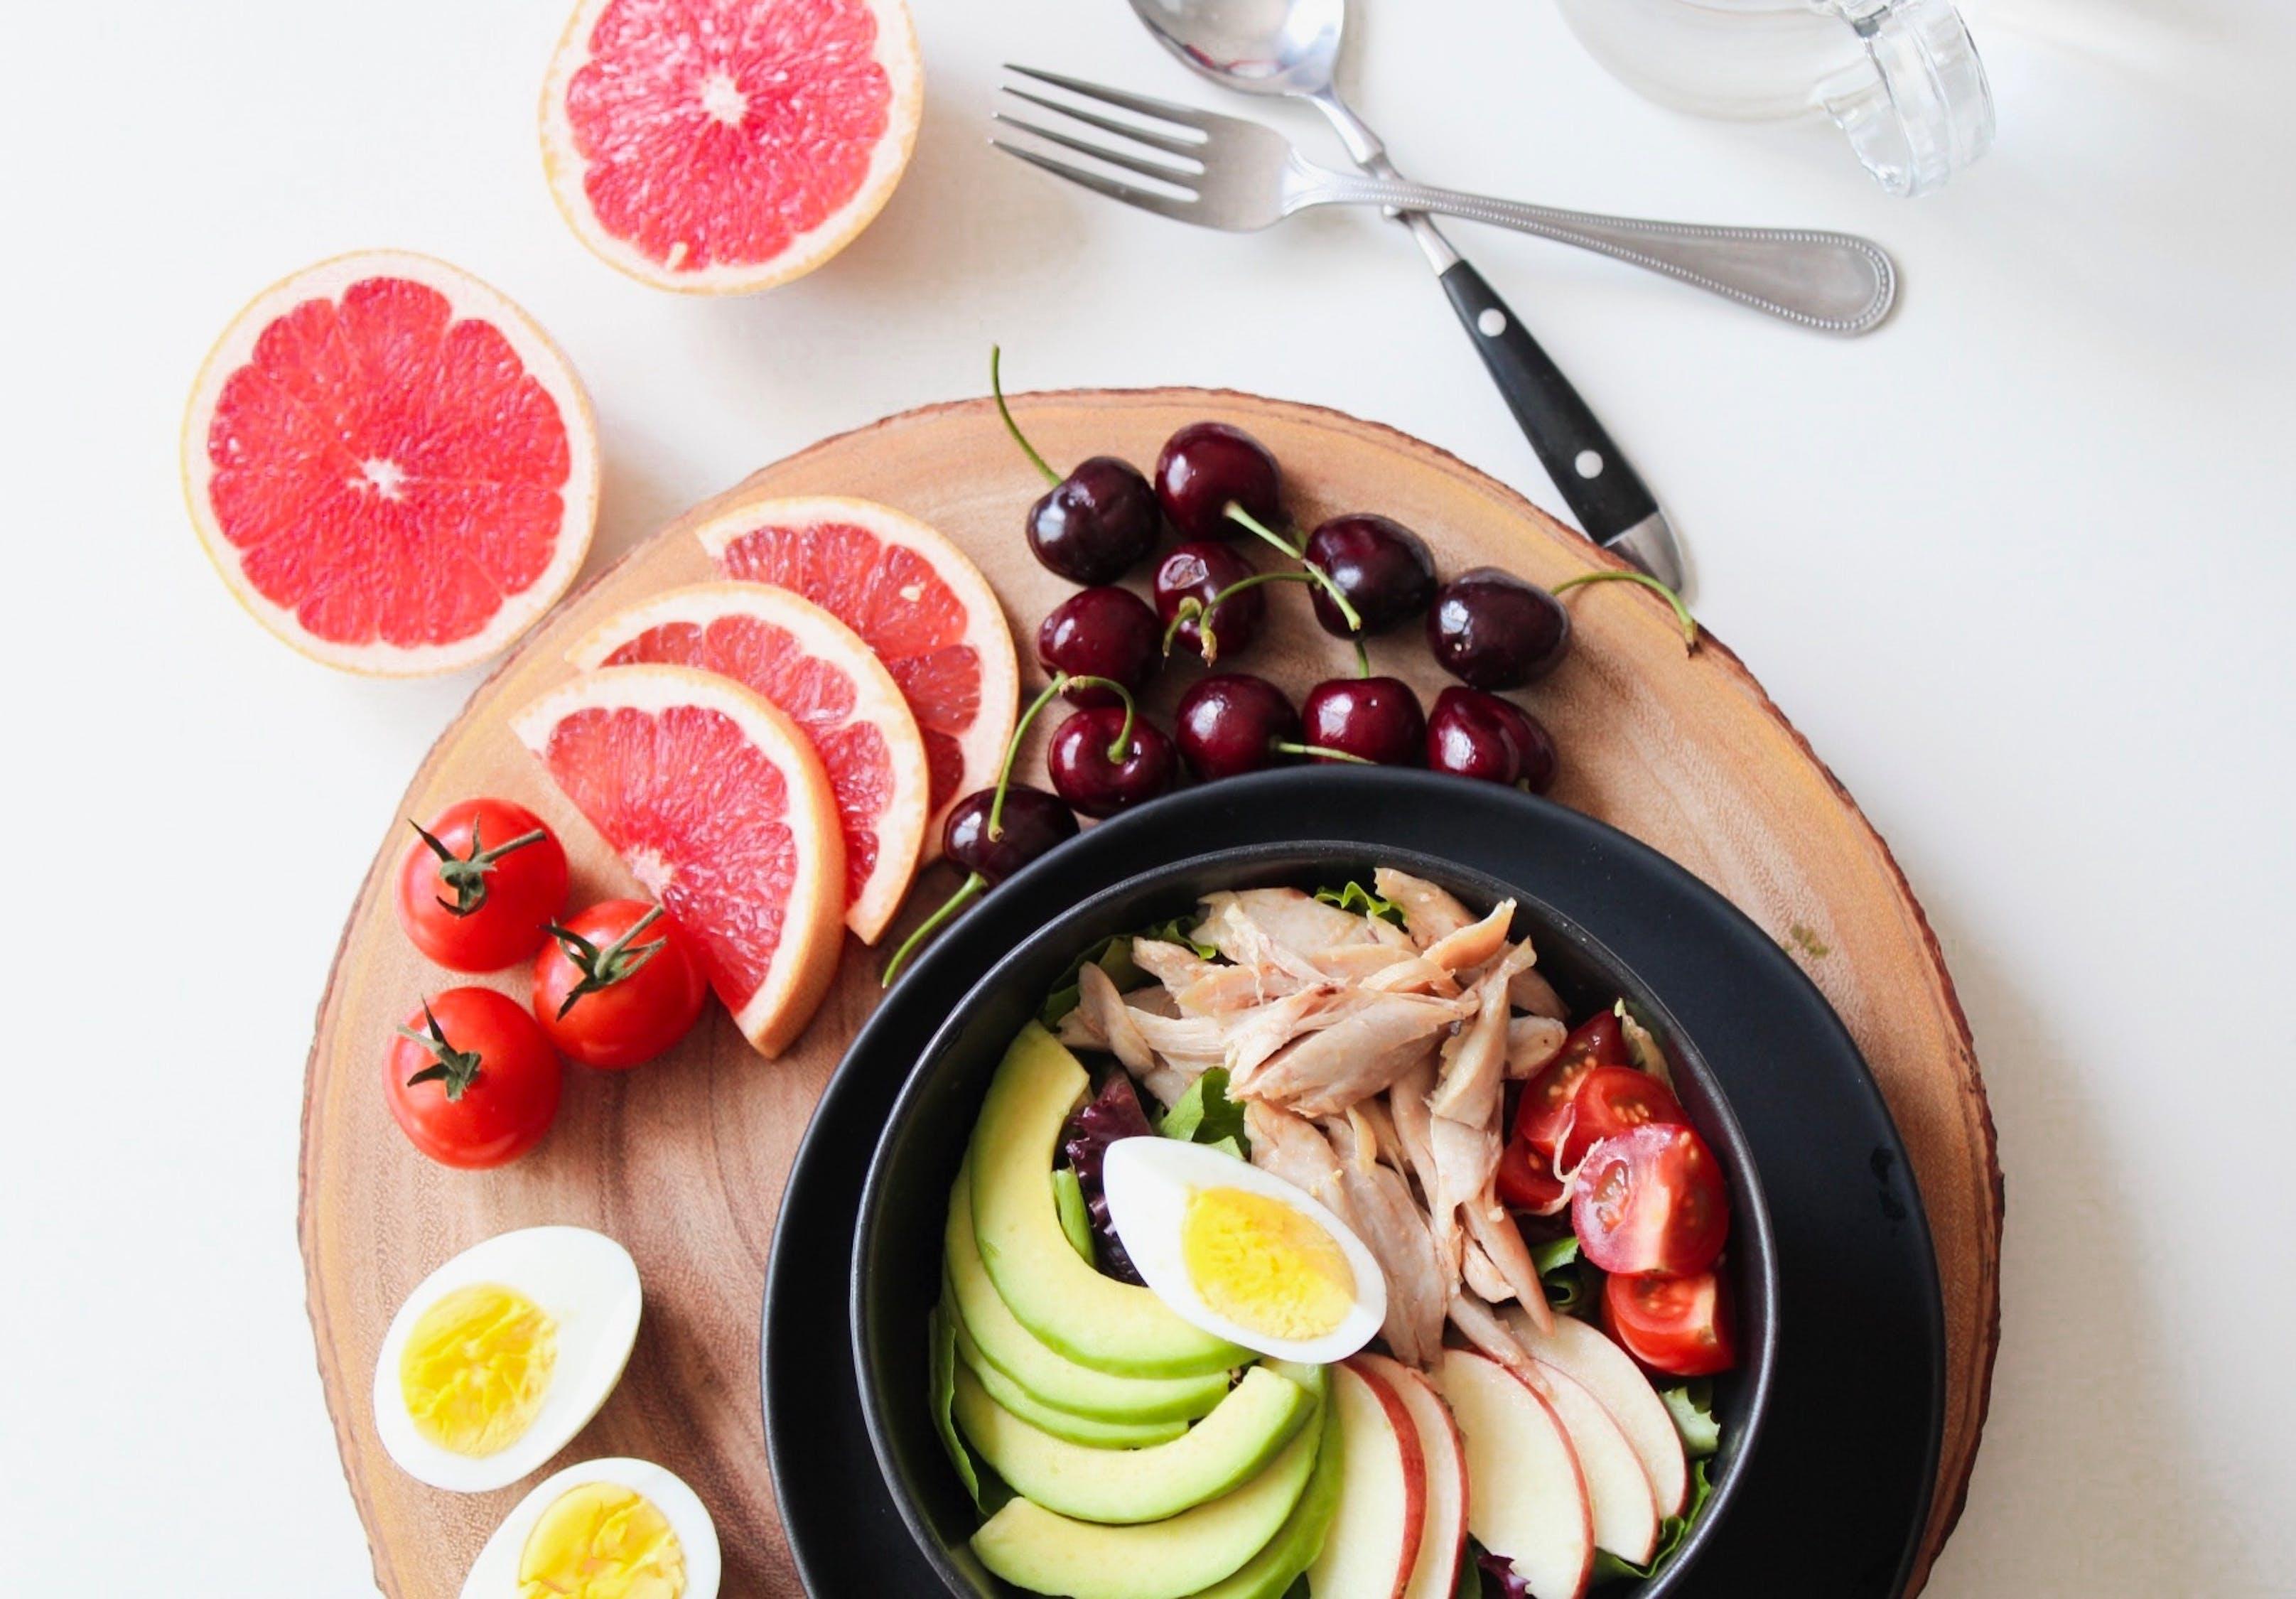 tips mencuci sayur dan buah pisahkan dengan bahan lain